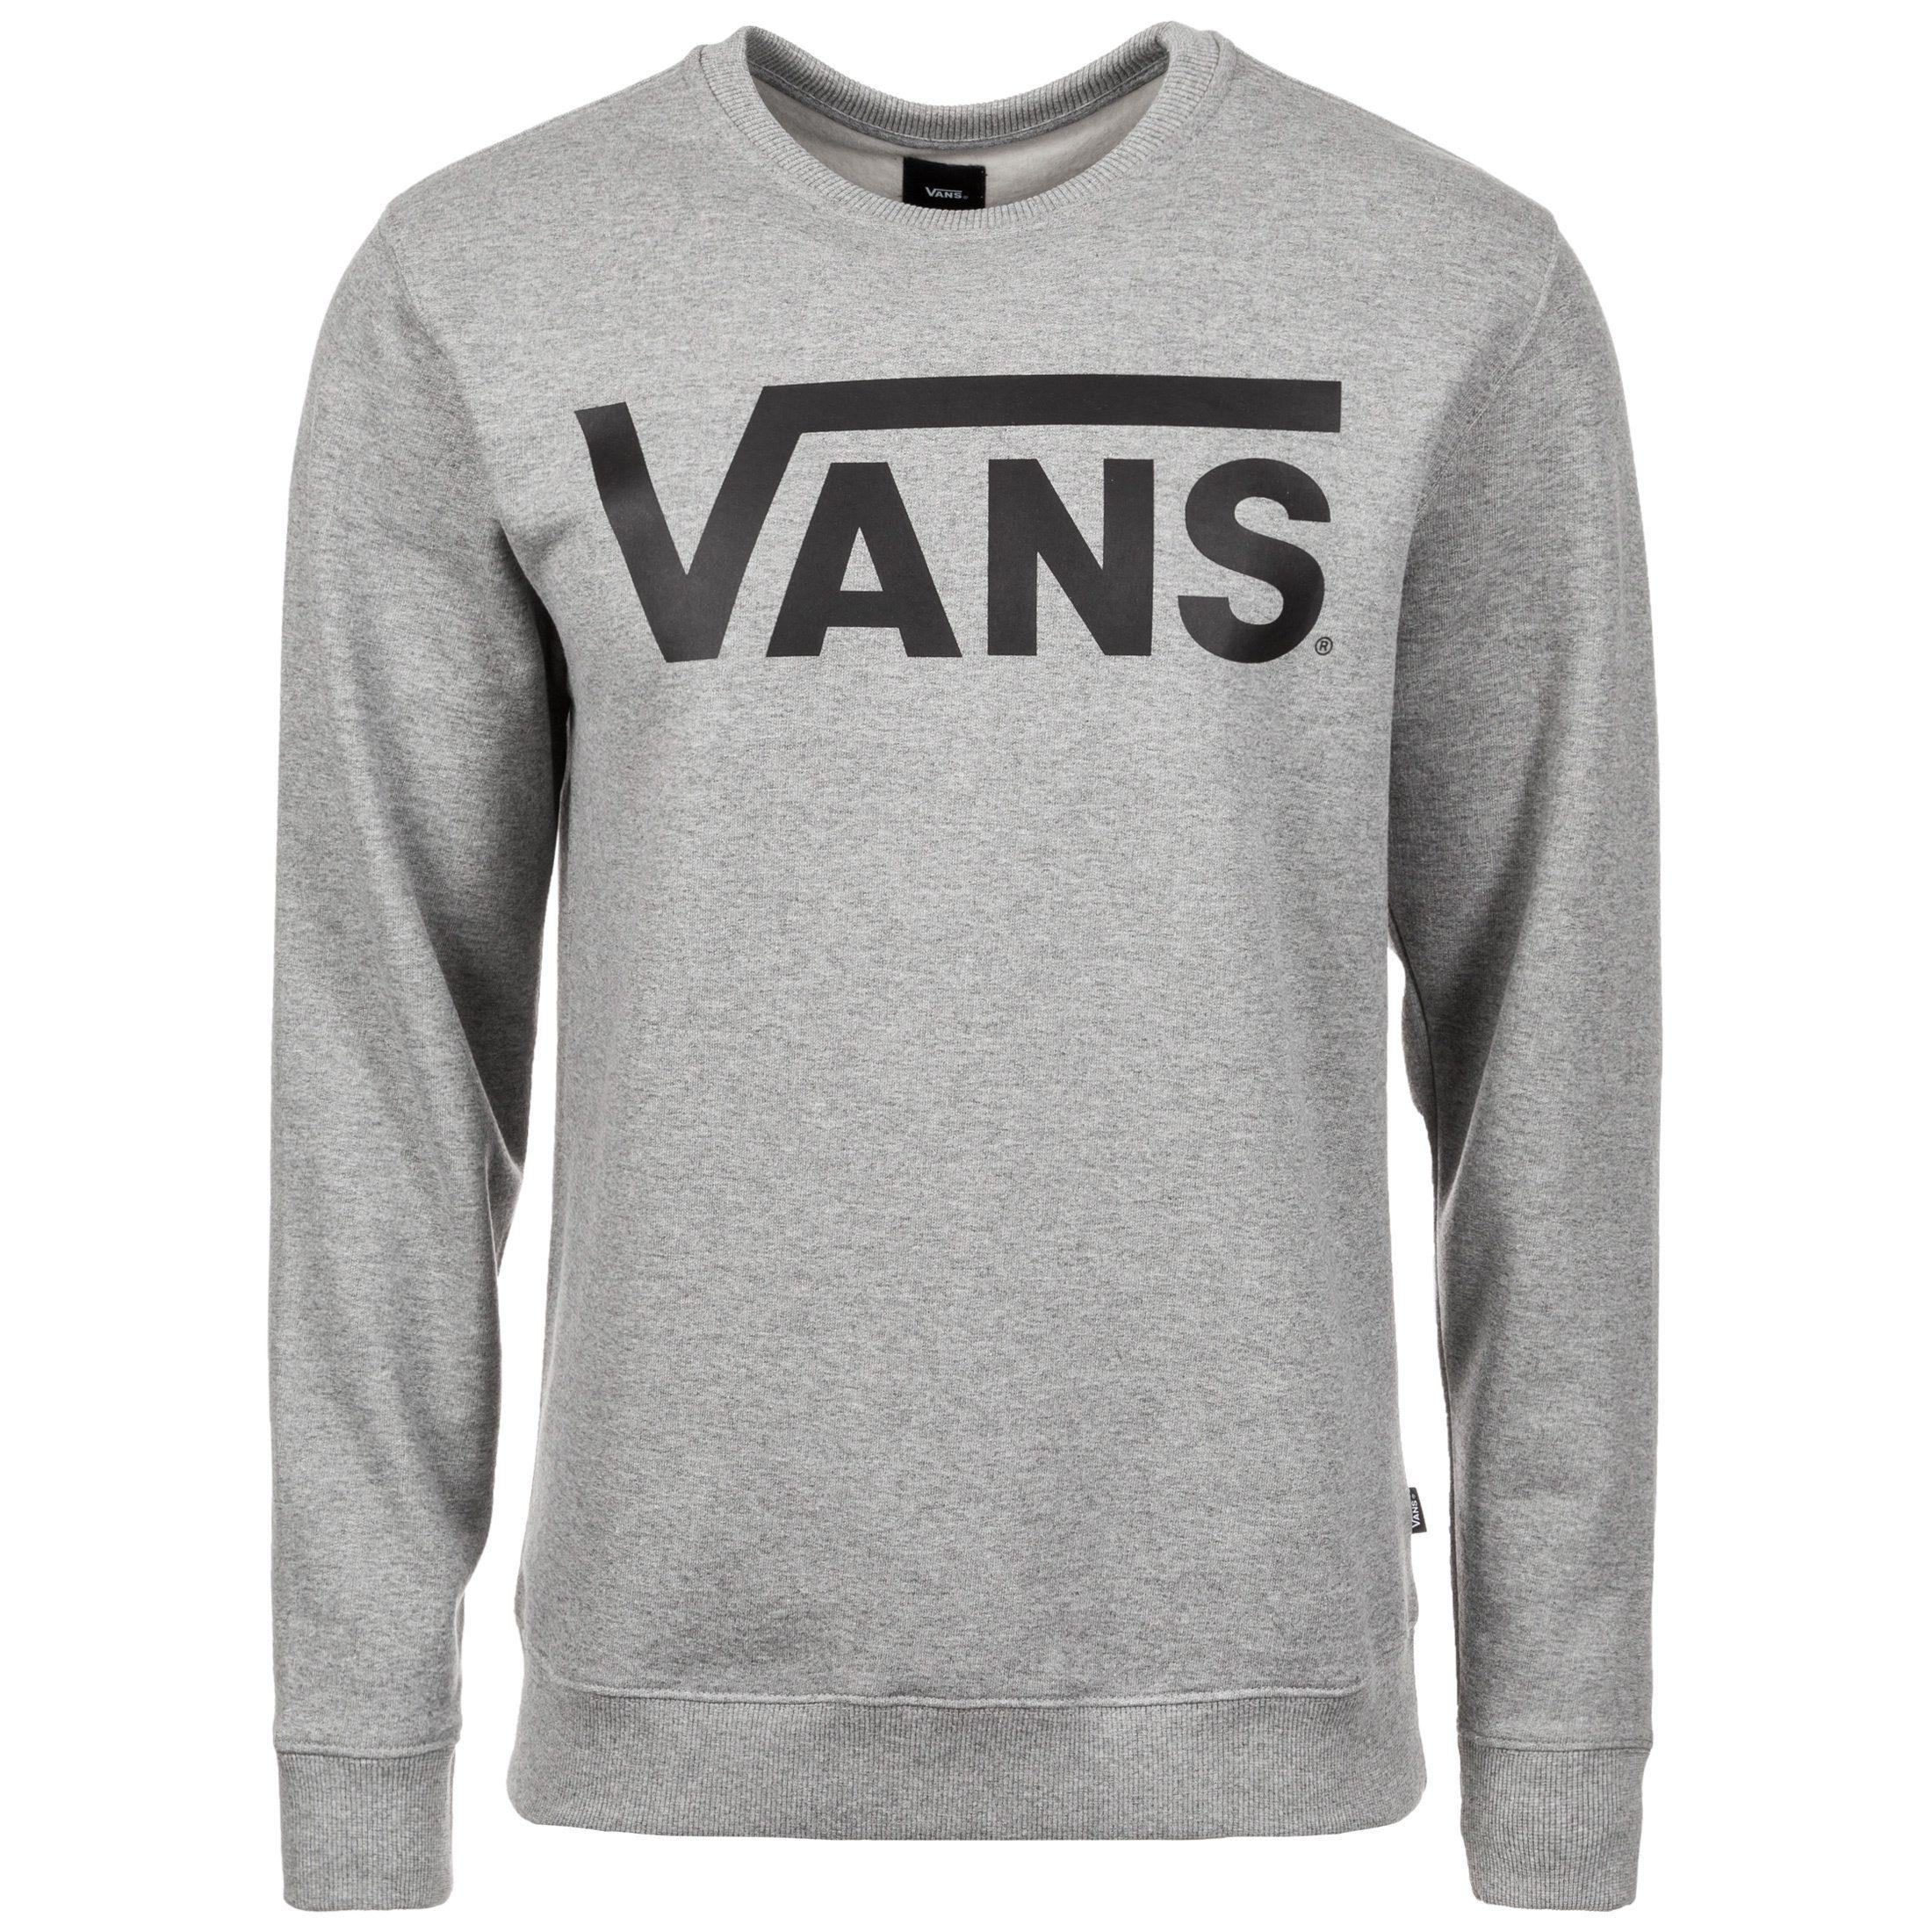 a92737970b6 grau-fleece Sweatshirts für Herren online kaufen | Herrenmode ...